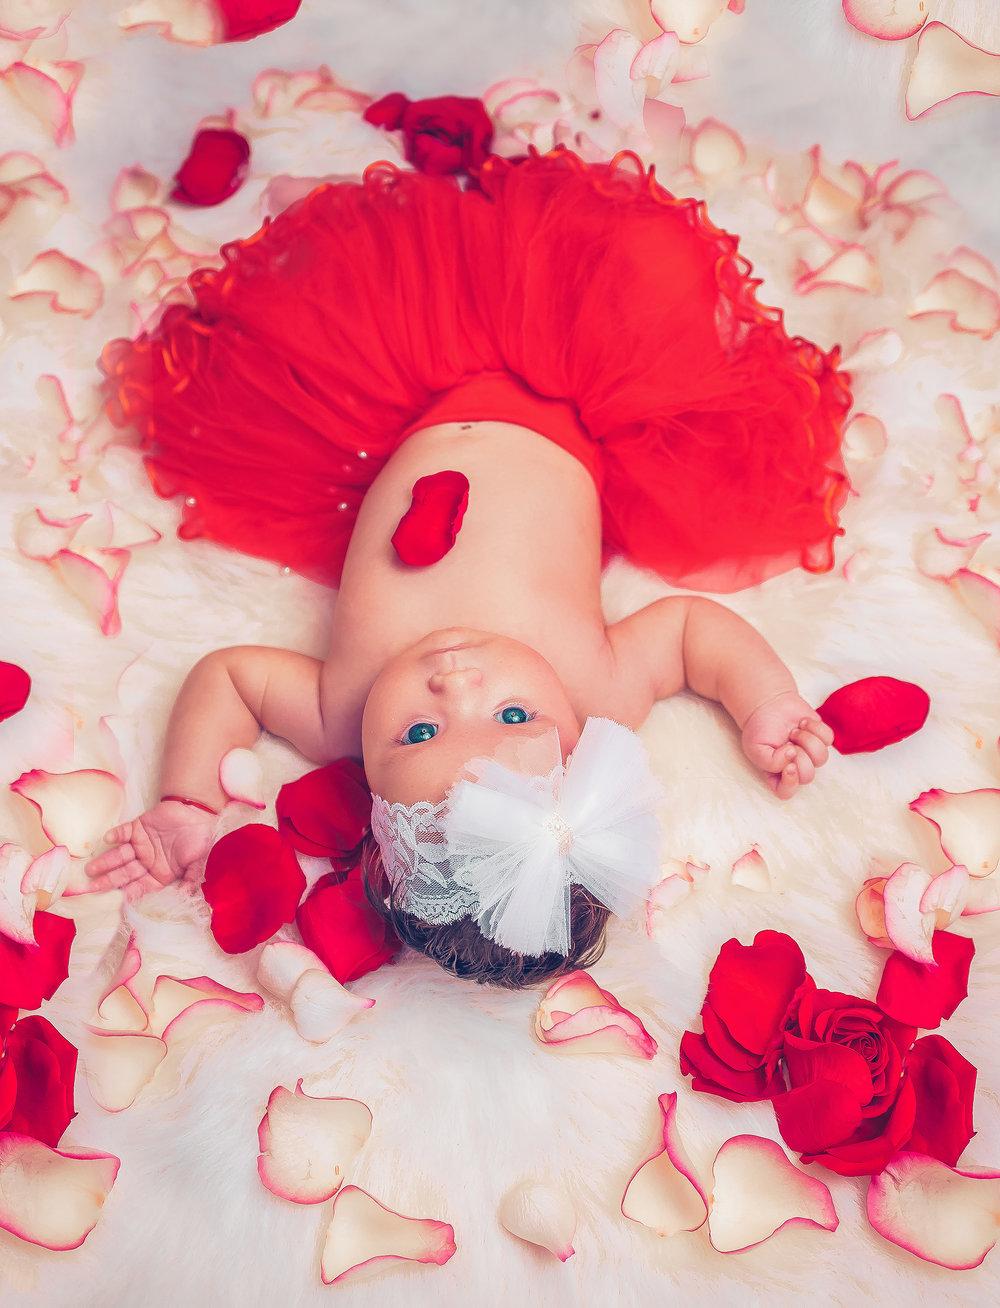 crina popescu sedinta foto bebe copil